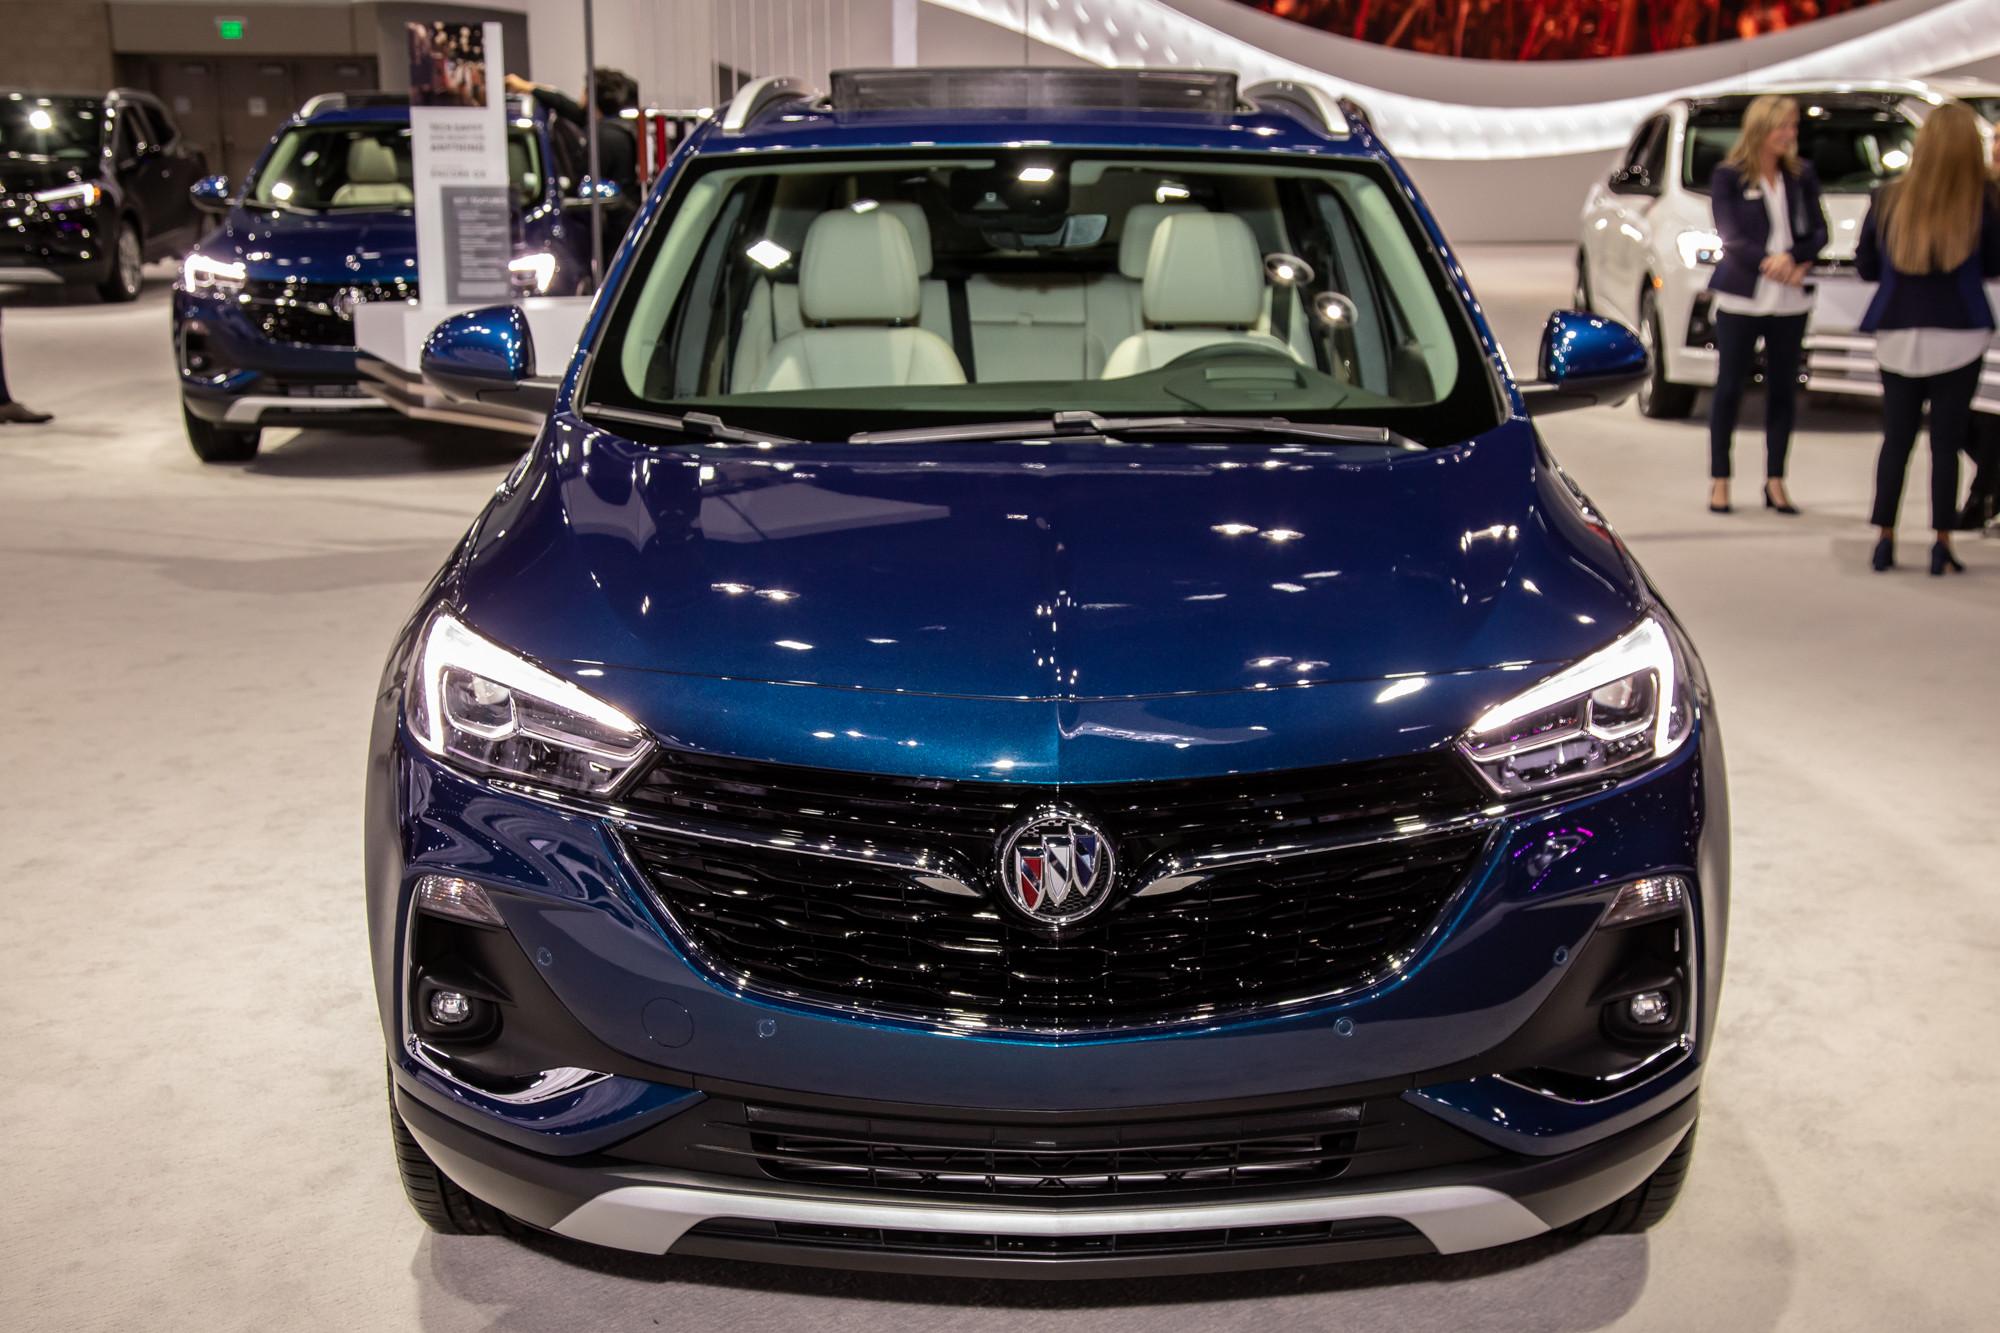 buick-encore-gx-2020-cl-02-blue-exterior-front.jpg